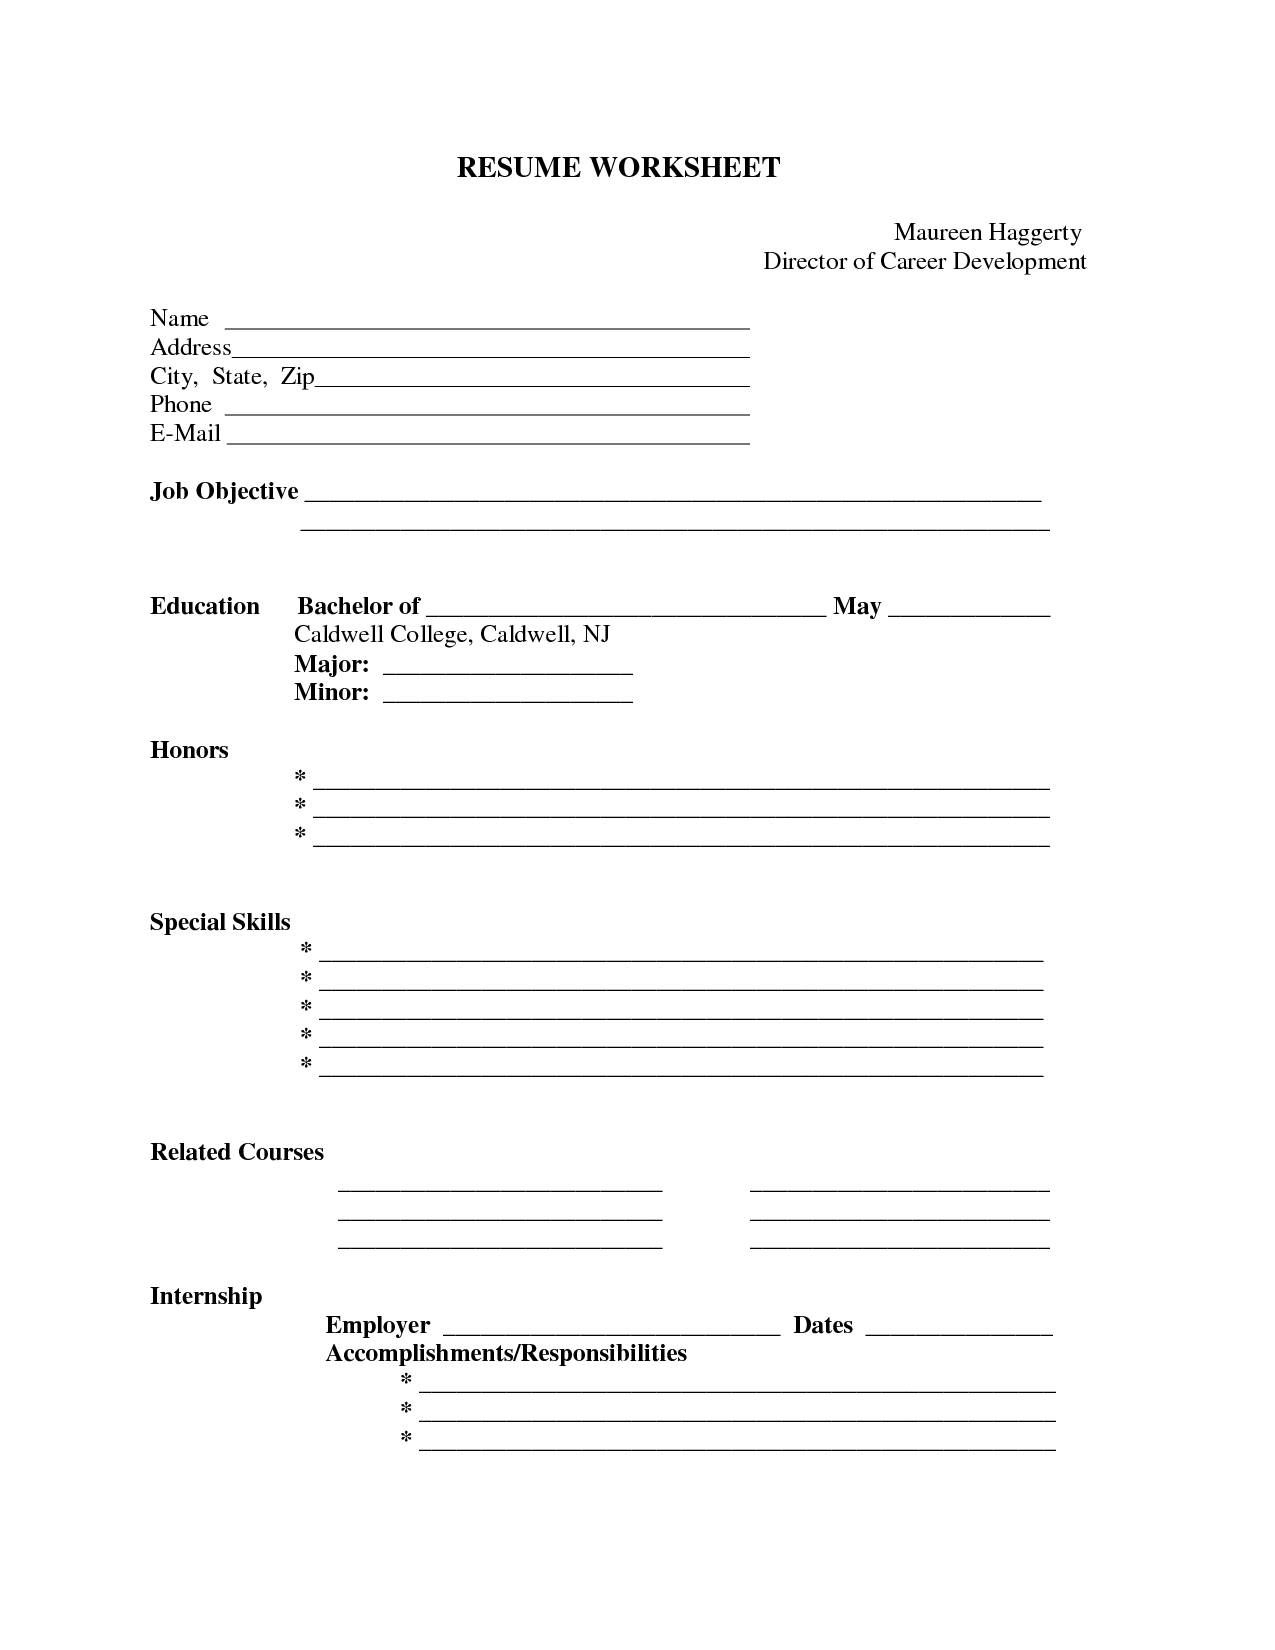 Pinresumejob On Resume Job | Resume Form, Free Printable Resume - Free Printable Resume Templates